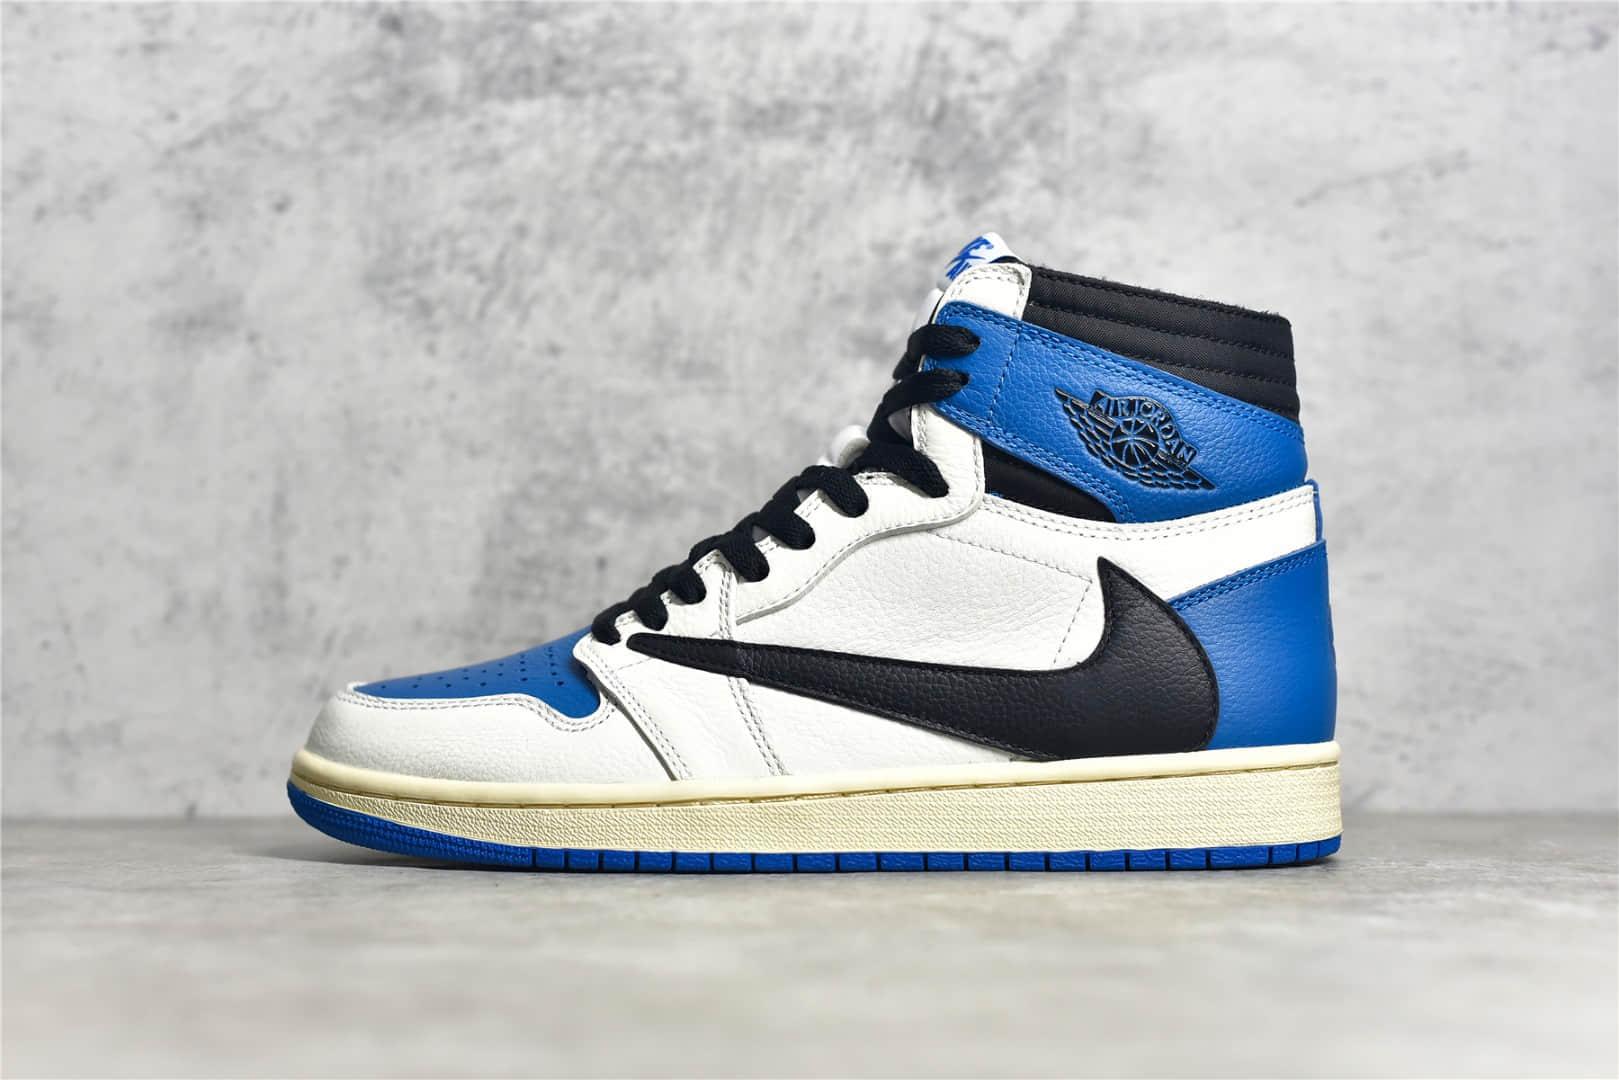 AJ1闪电倒钩高帮 Fragment × Nike Air Jordan 1 x Travis Scott AJ1藤原浩斯科特三方联名 货号:DH3327-105-潮流者之家